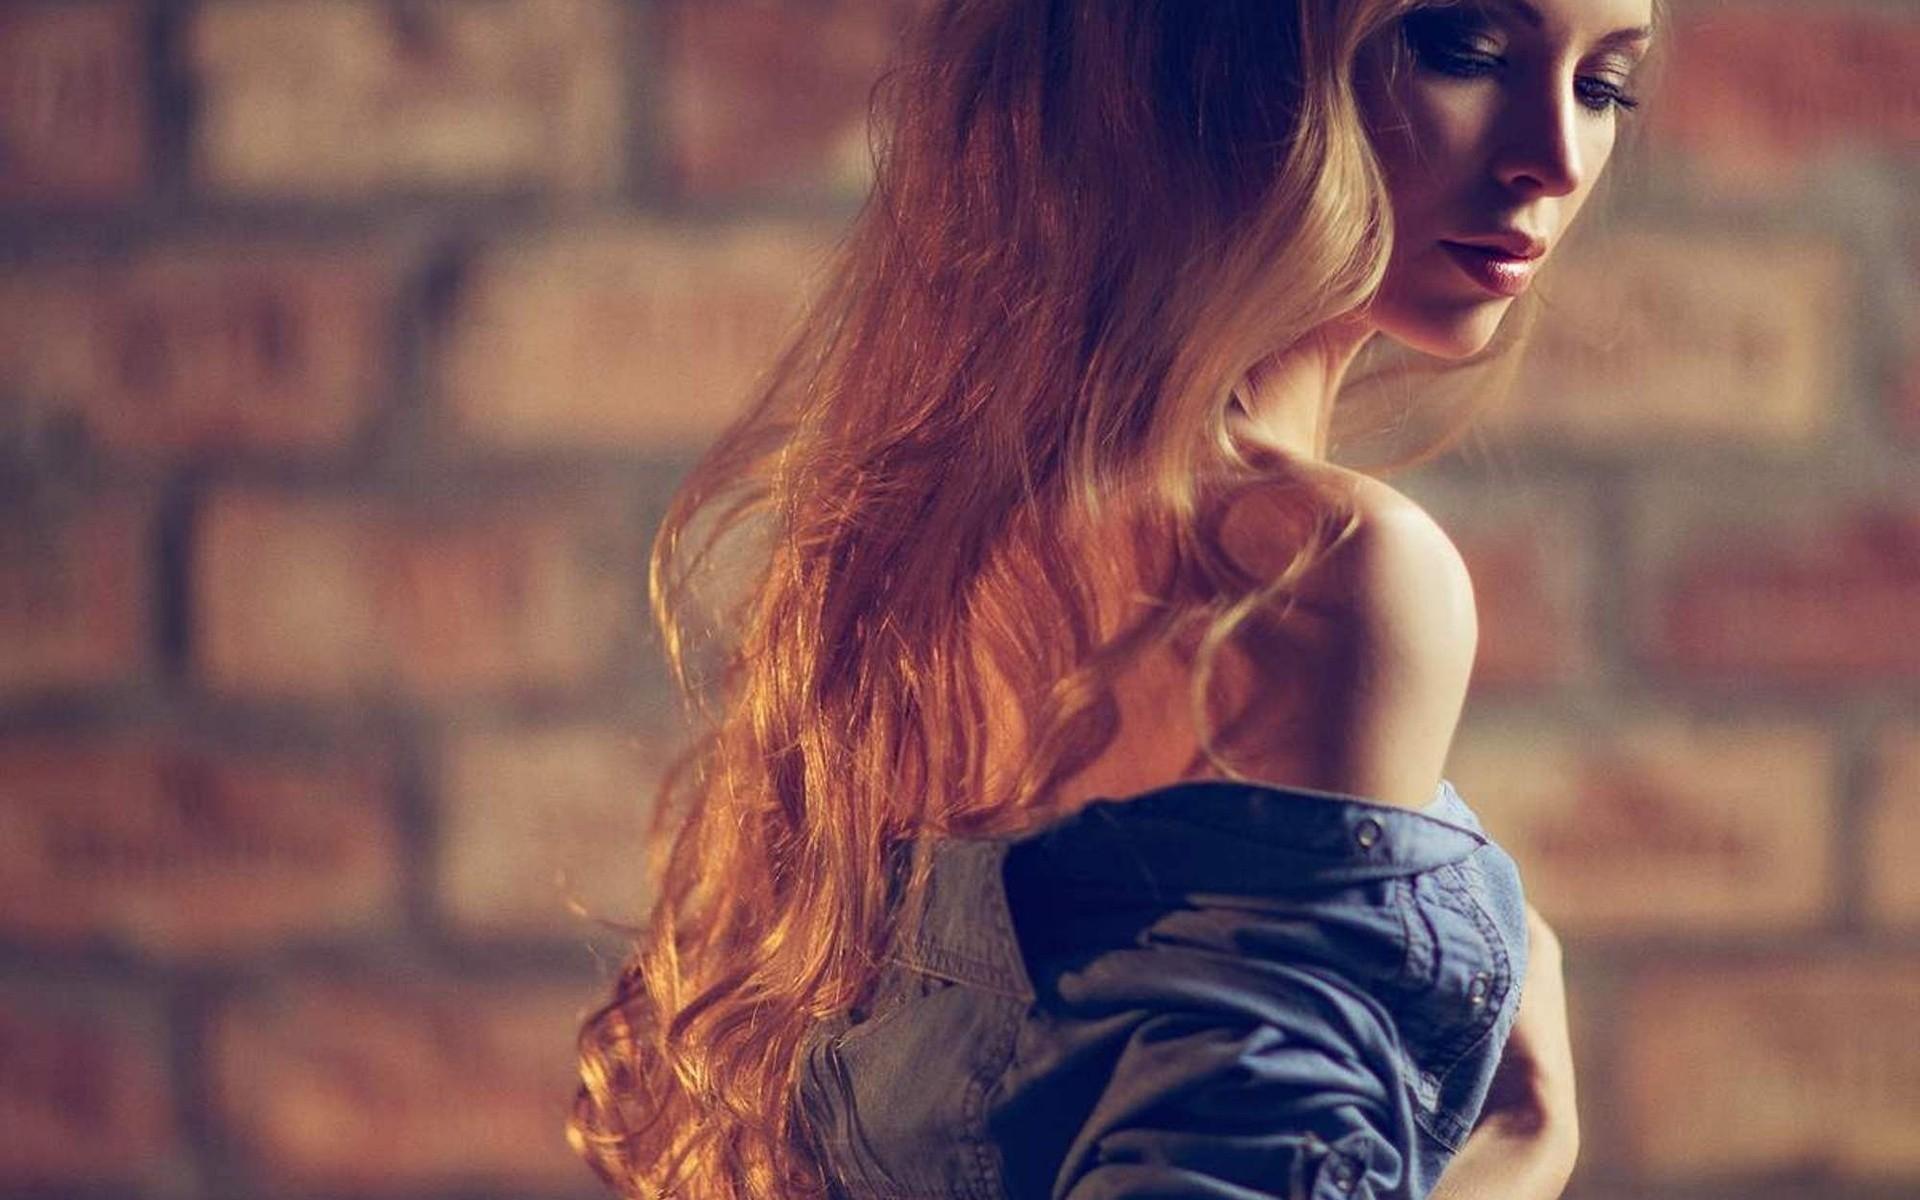 model long hair women redhead